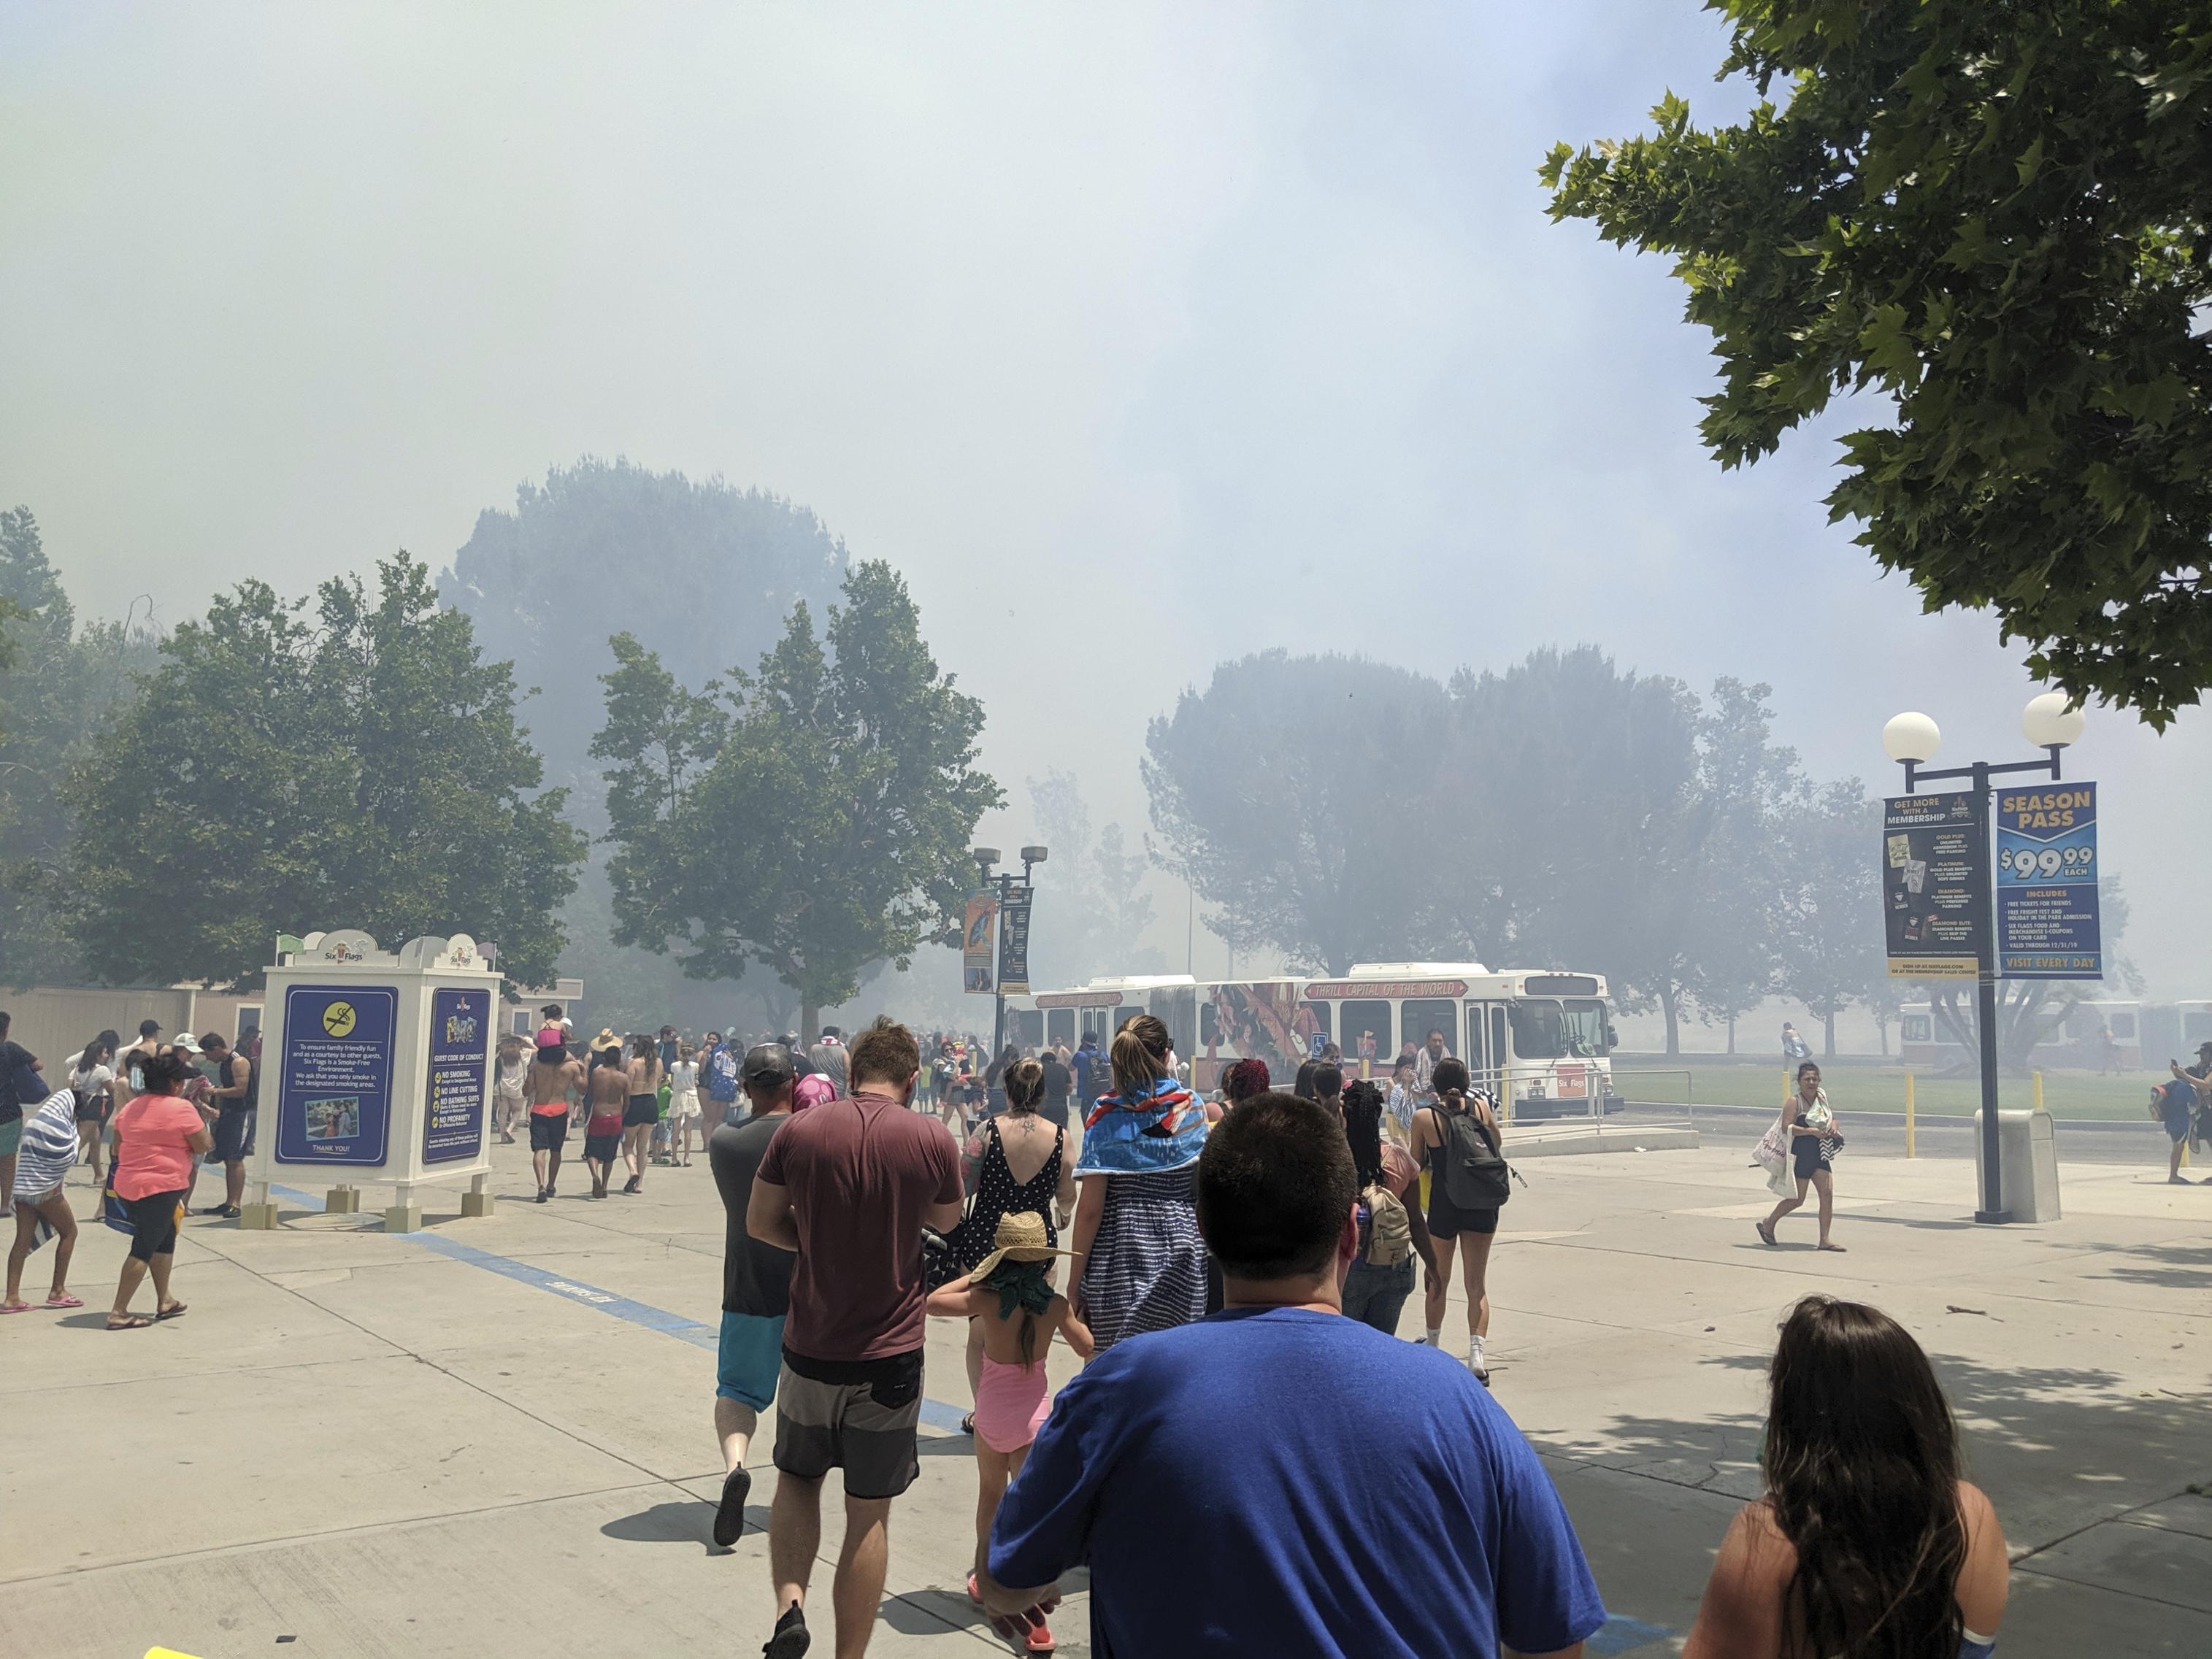 Brush fire sets off evacuation at California amusement park | The